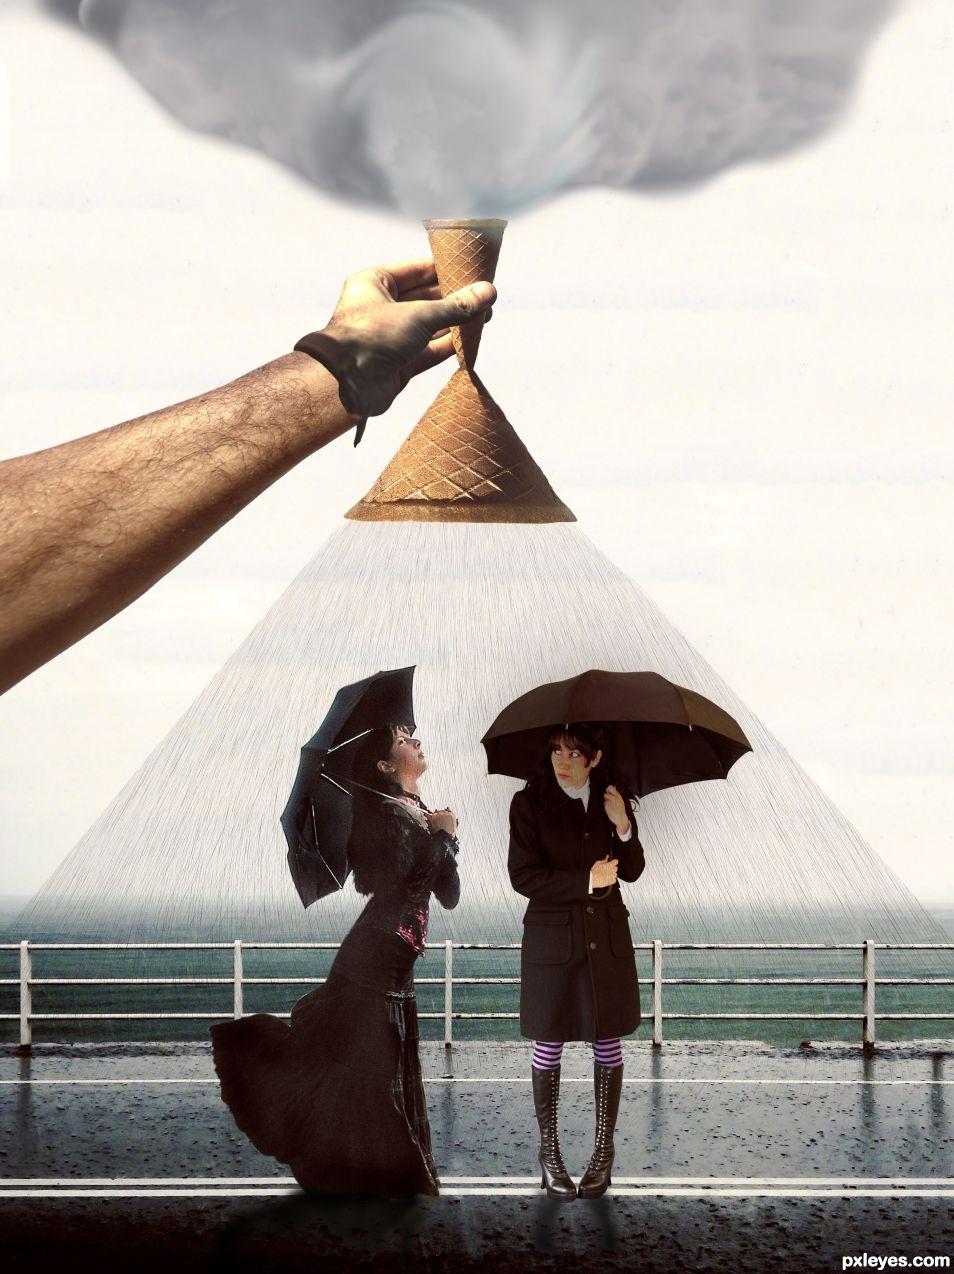 The rain-maker